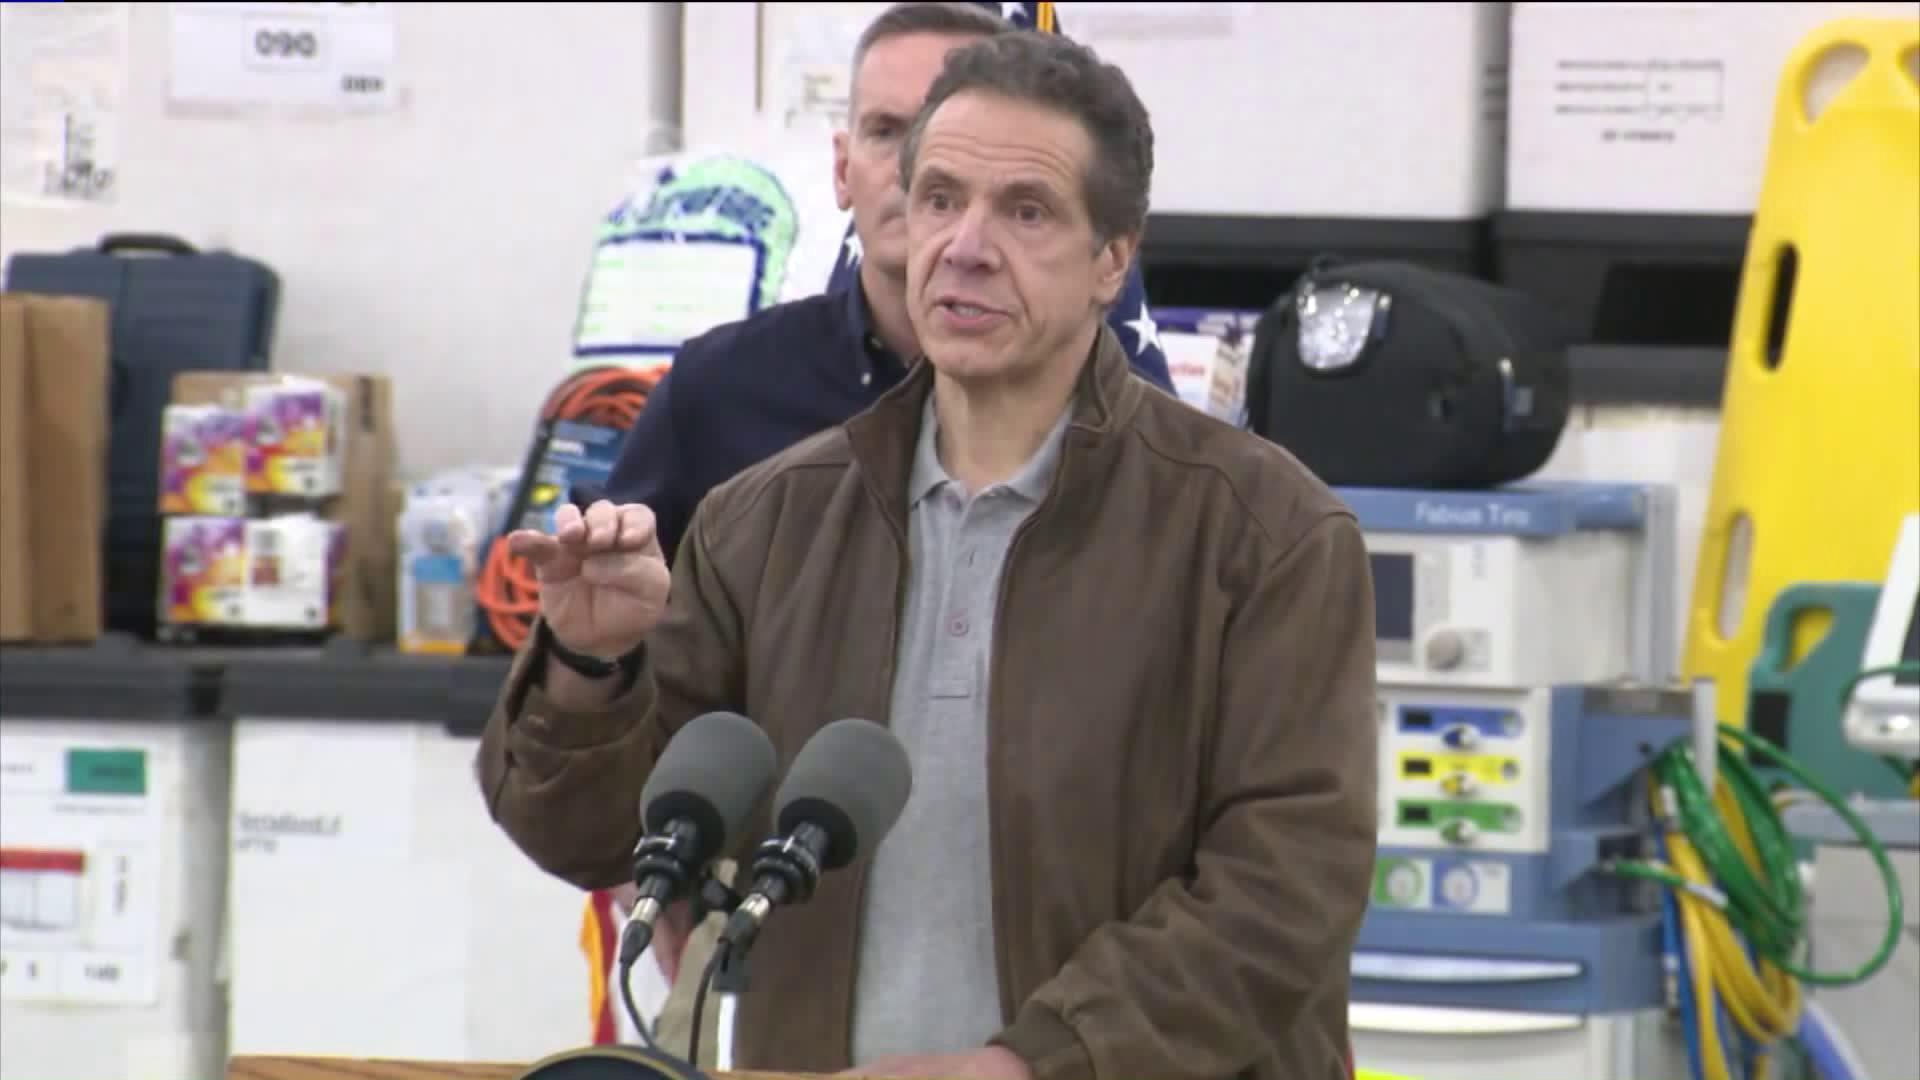 Coronavirus: New York Confirms More Than 20,000 Cases, Cuomo Says